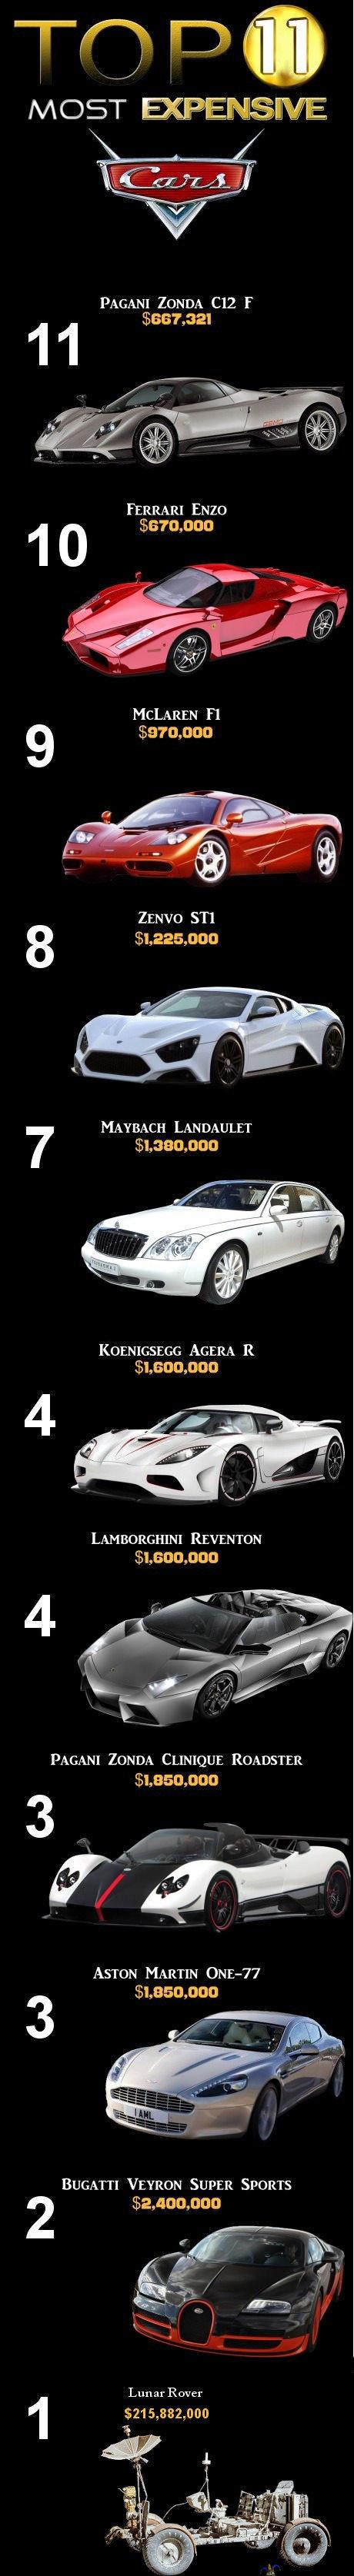 Most expensive cars in the world.. Found it on and all the credit goes to make of this.. ZONDA F 321 FERRARI ENE!) tlt) Sama, tatt MC LAREN Fl 9 ttritt, ttchtt